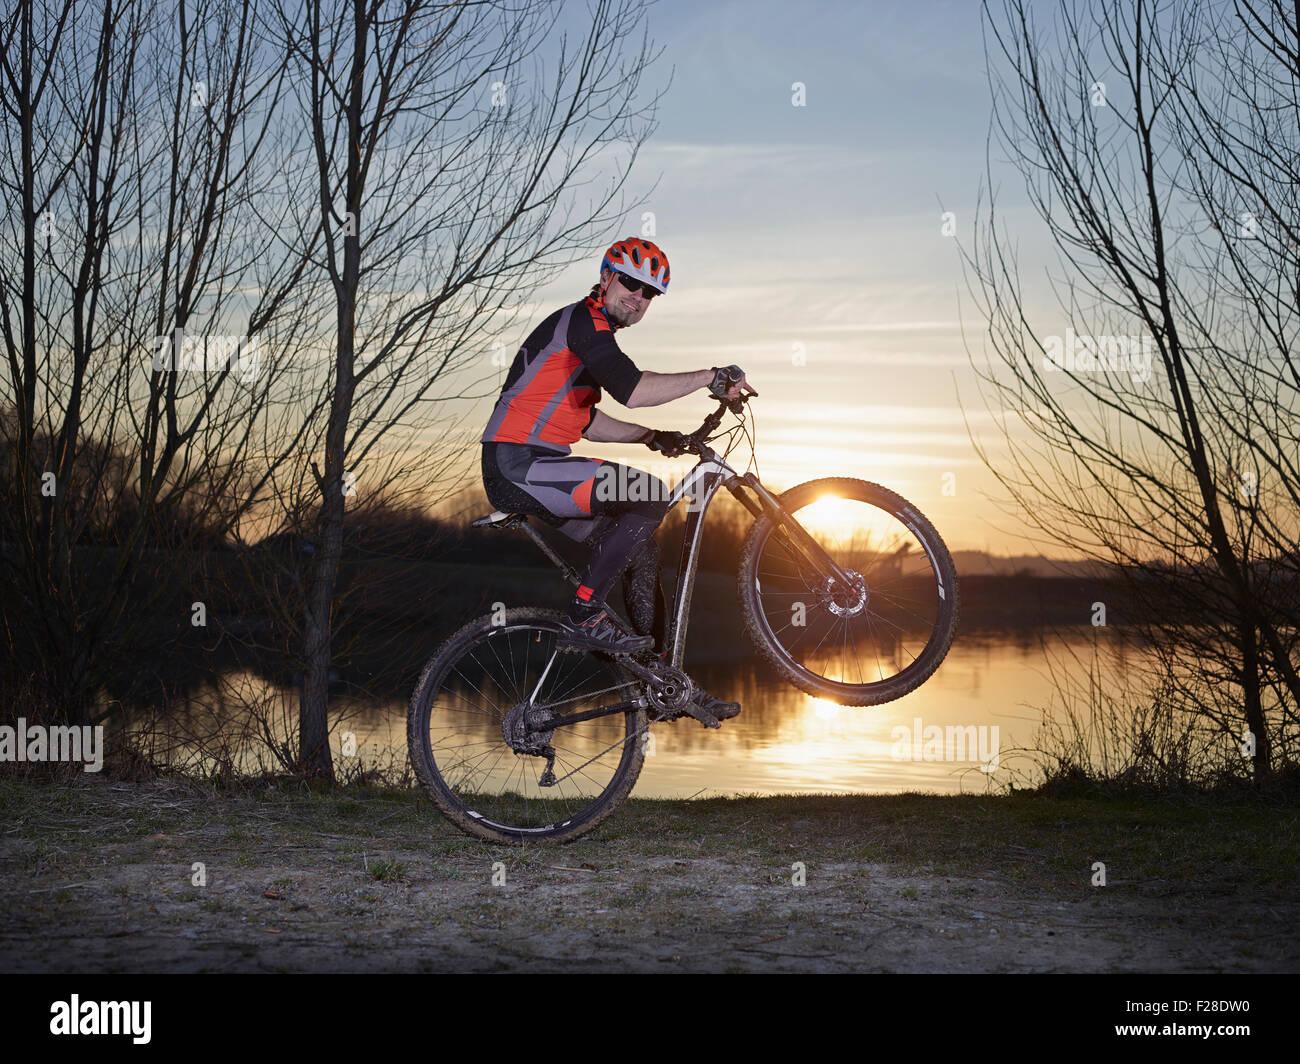 Mature man doing stunts on mountain bike during sunset, Bavaria, Germany Stock Photo